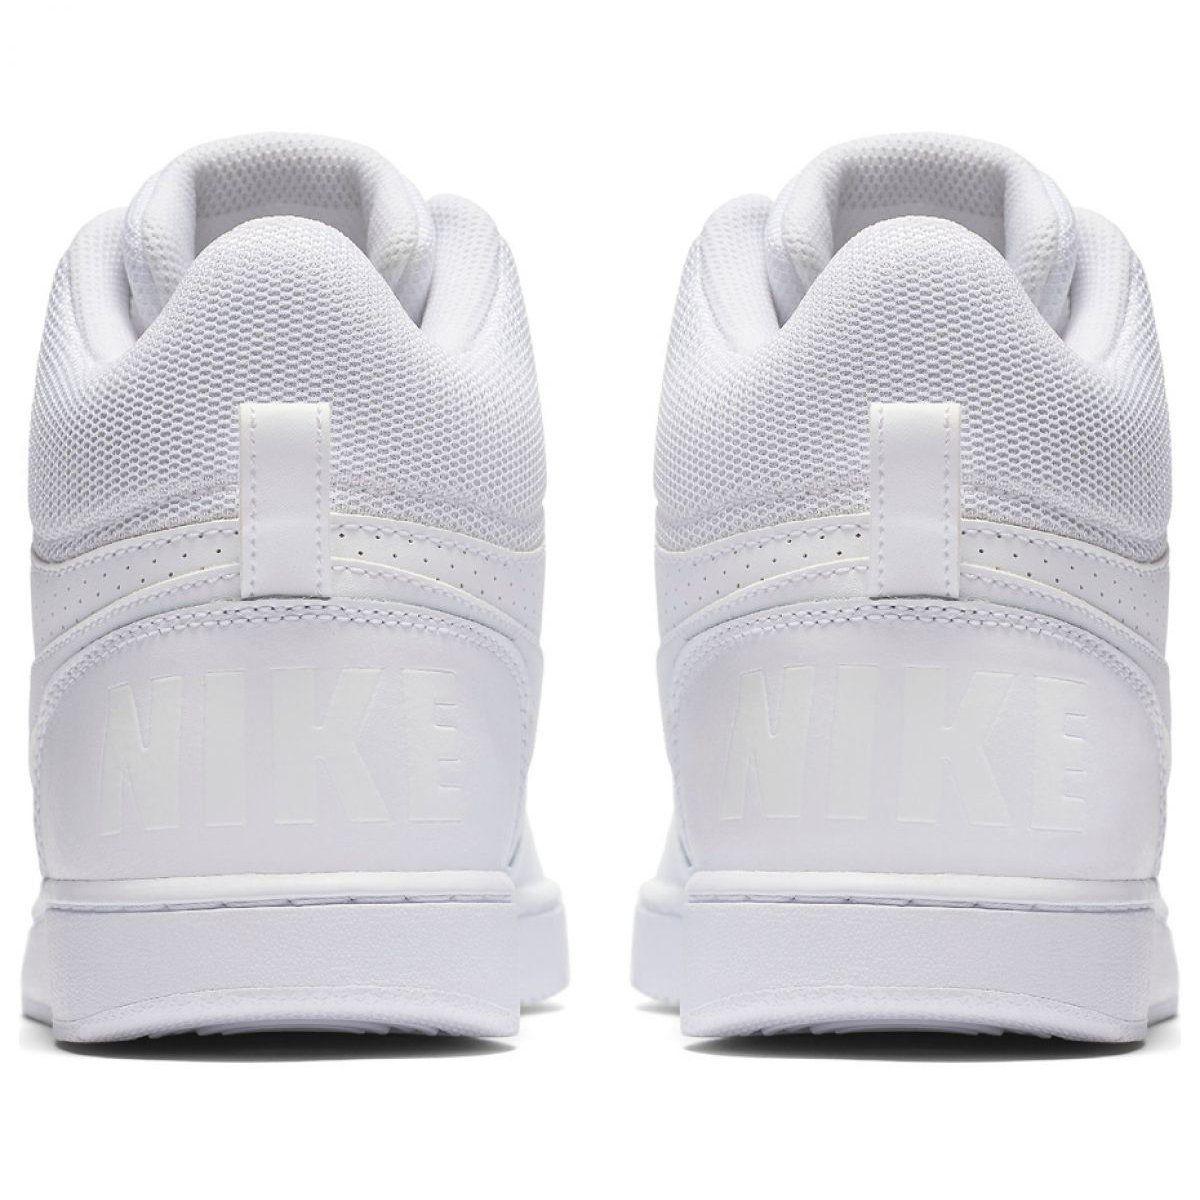 Nike Court Borough Mid M 838938 111 Shoes White Mens Nike Shoes Shoe Manufacturers Shoes